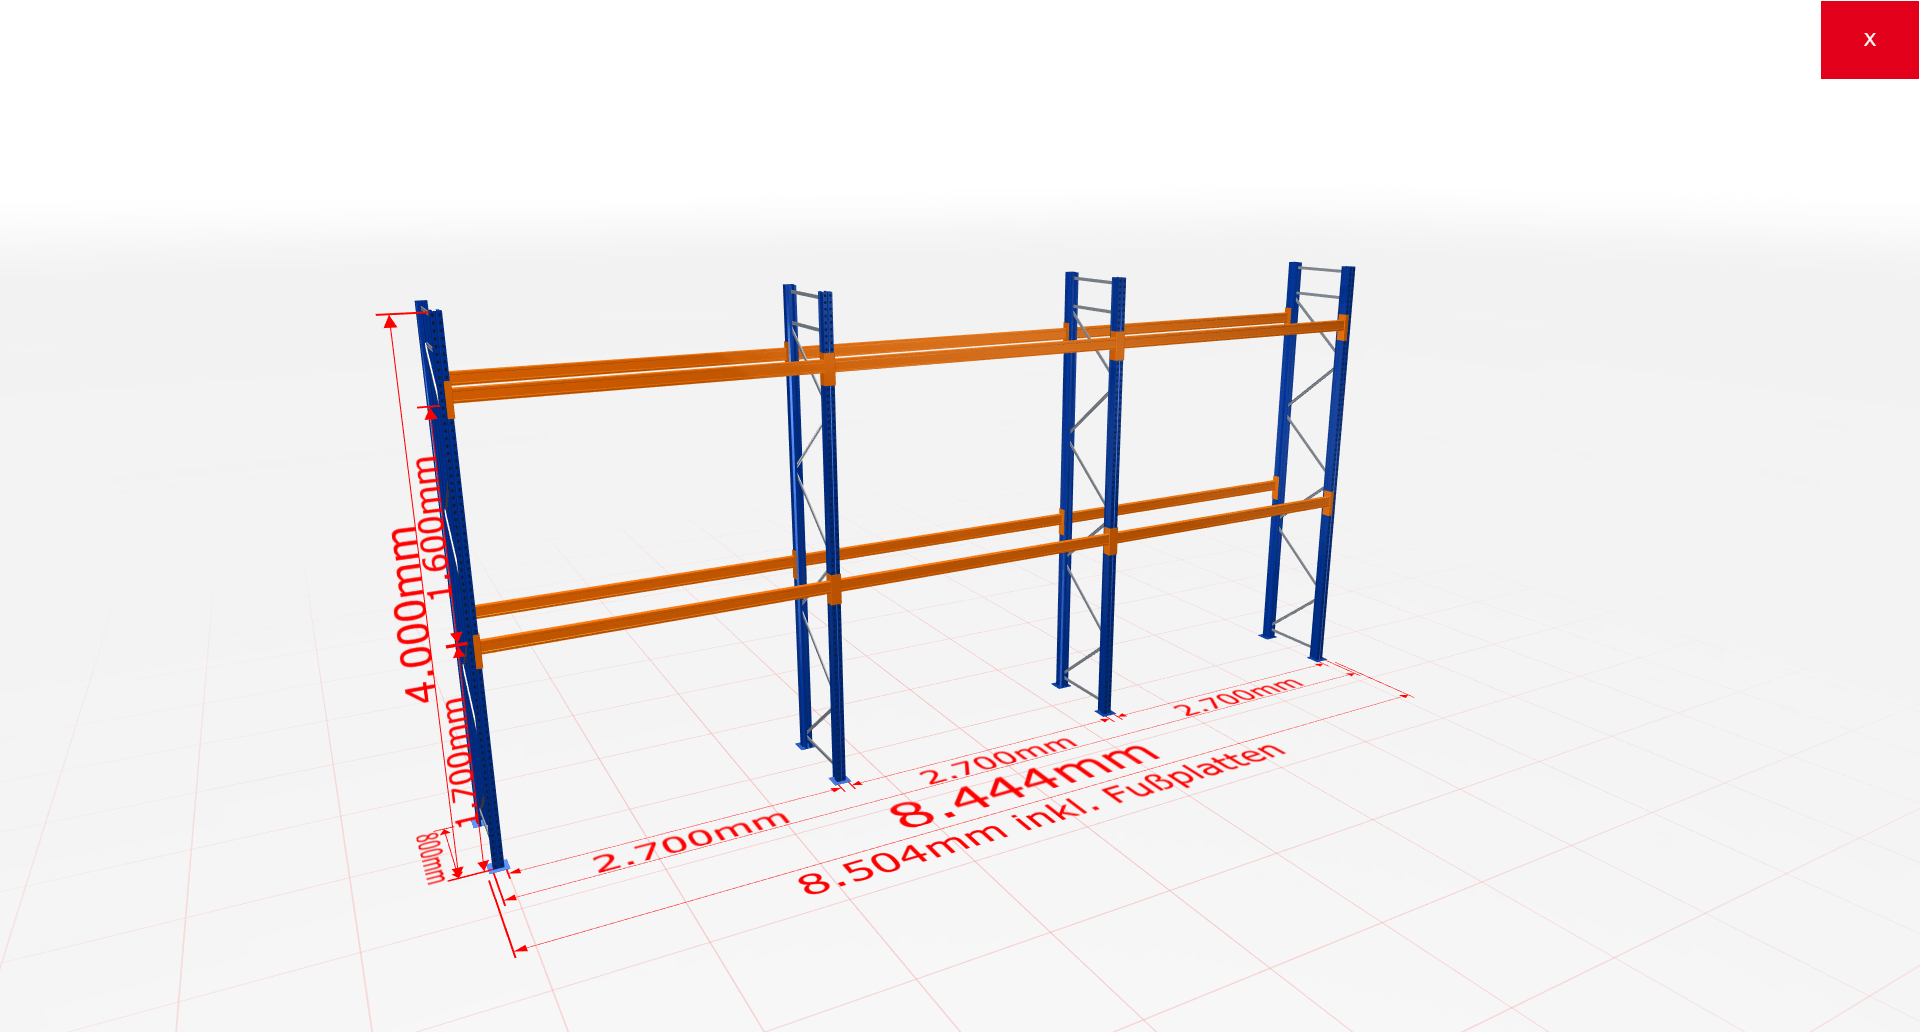 Palettenregal Komplettregal 4000x8444x800 mm (HxBxT) 2 Fachebenen SCHULTE Lagertechnik